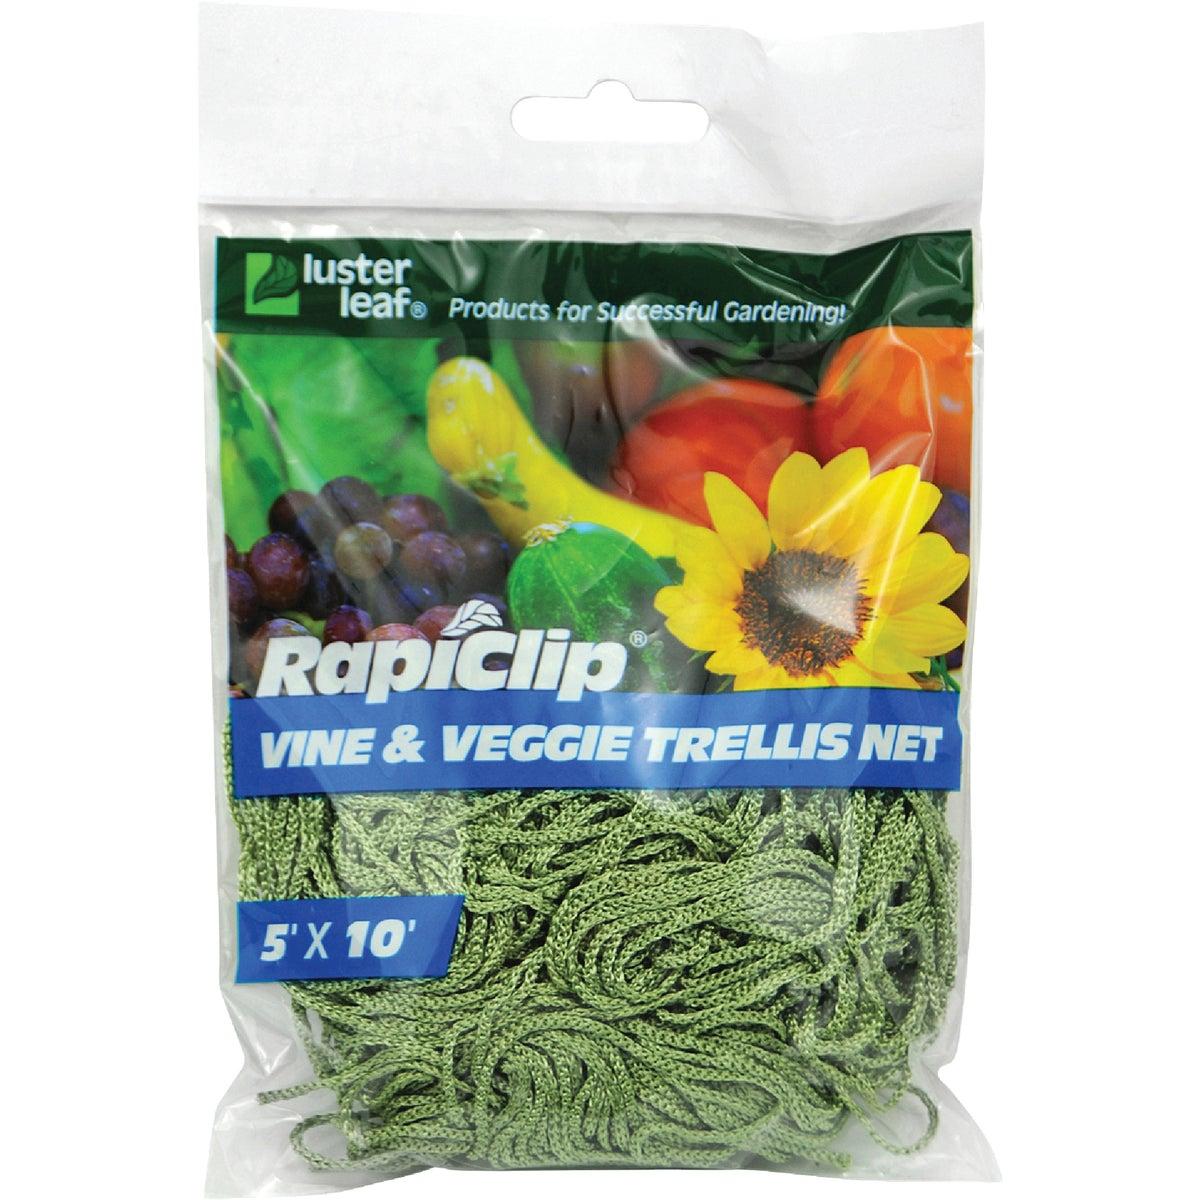 VINE/VEGGIE TRELLIS NET - 864 by Luster Leaf Prod Inc